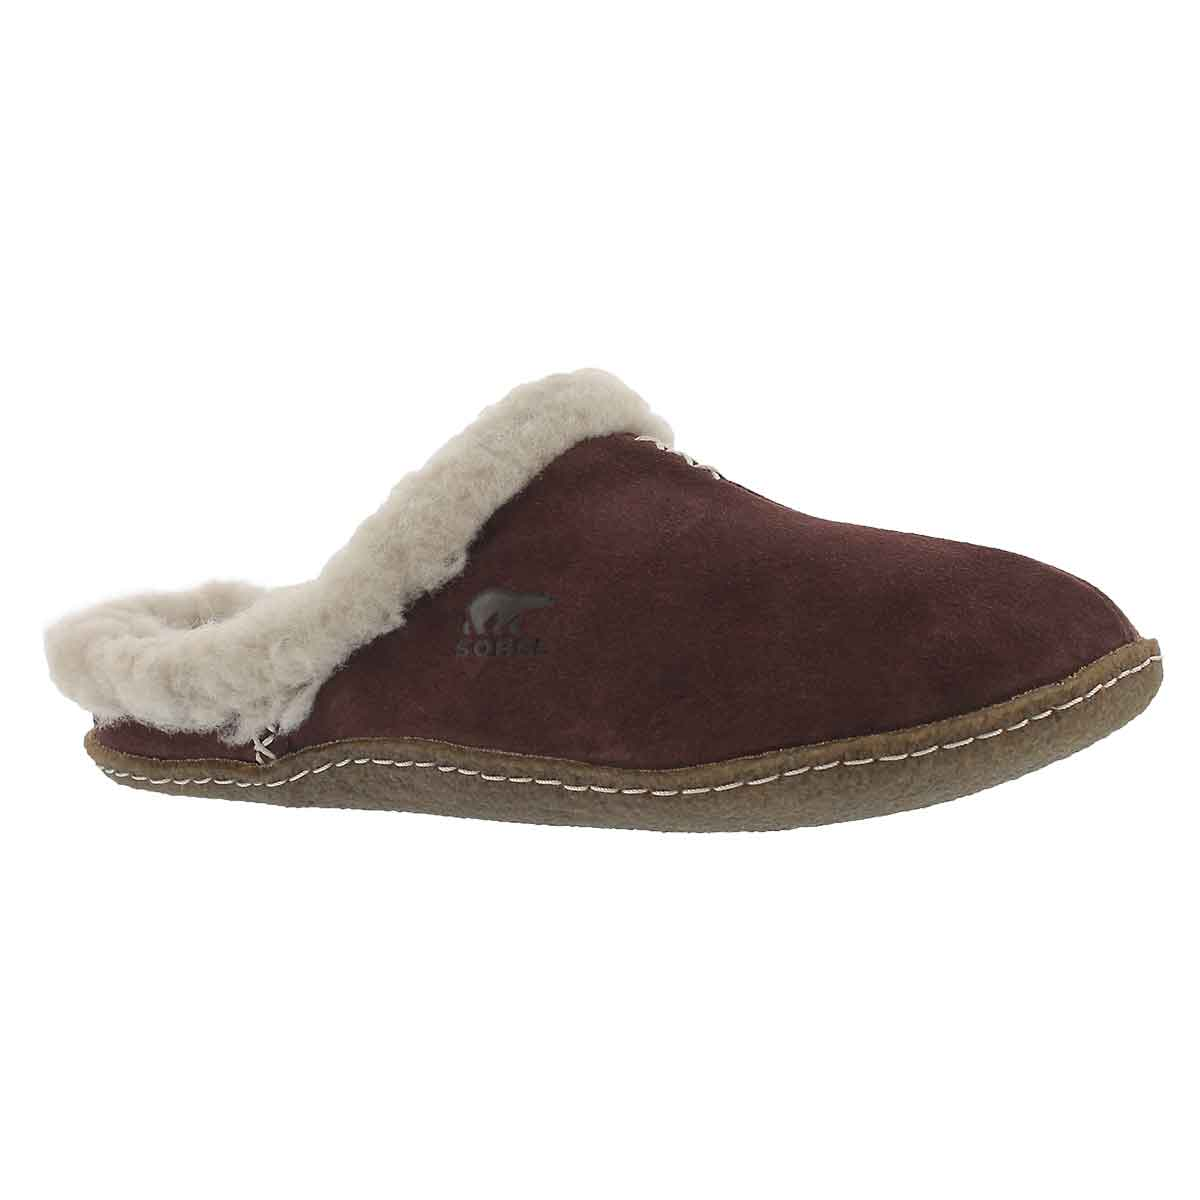 Women's NAKISKA SLIDE redwood suede slippers